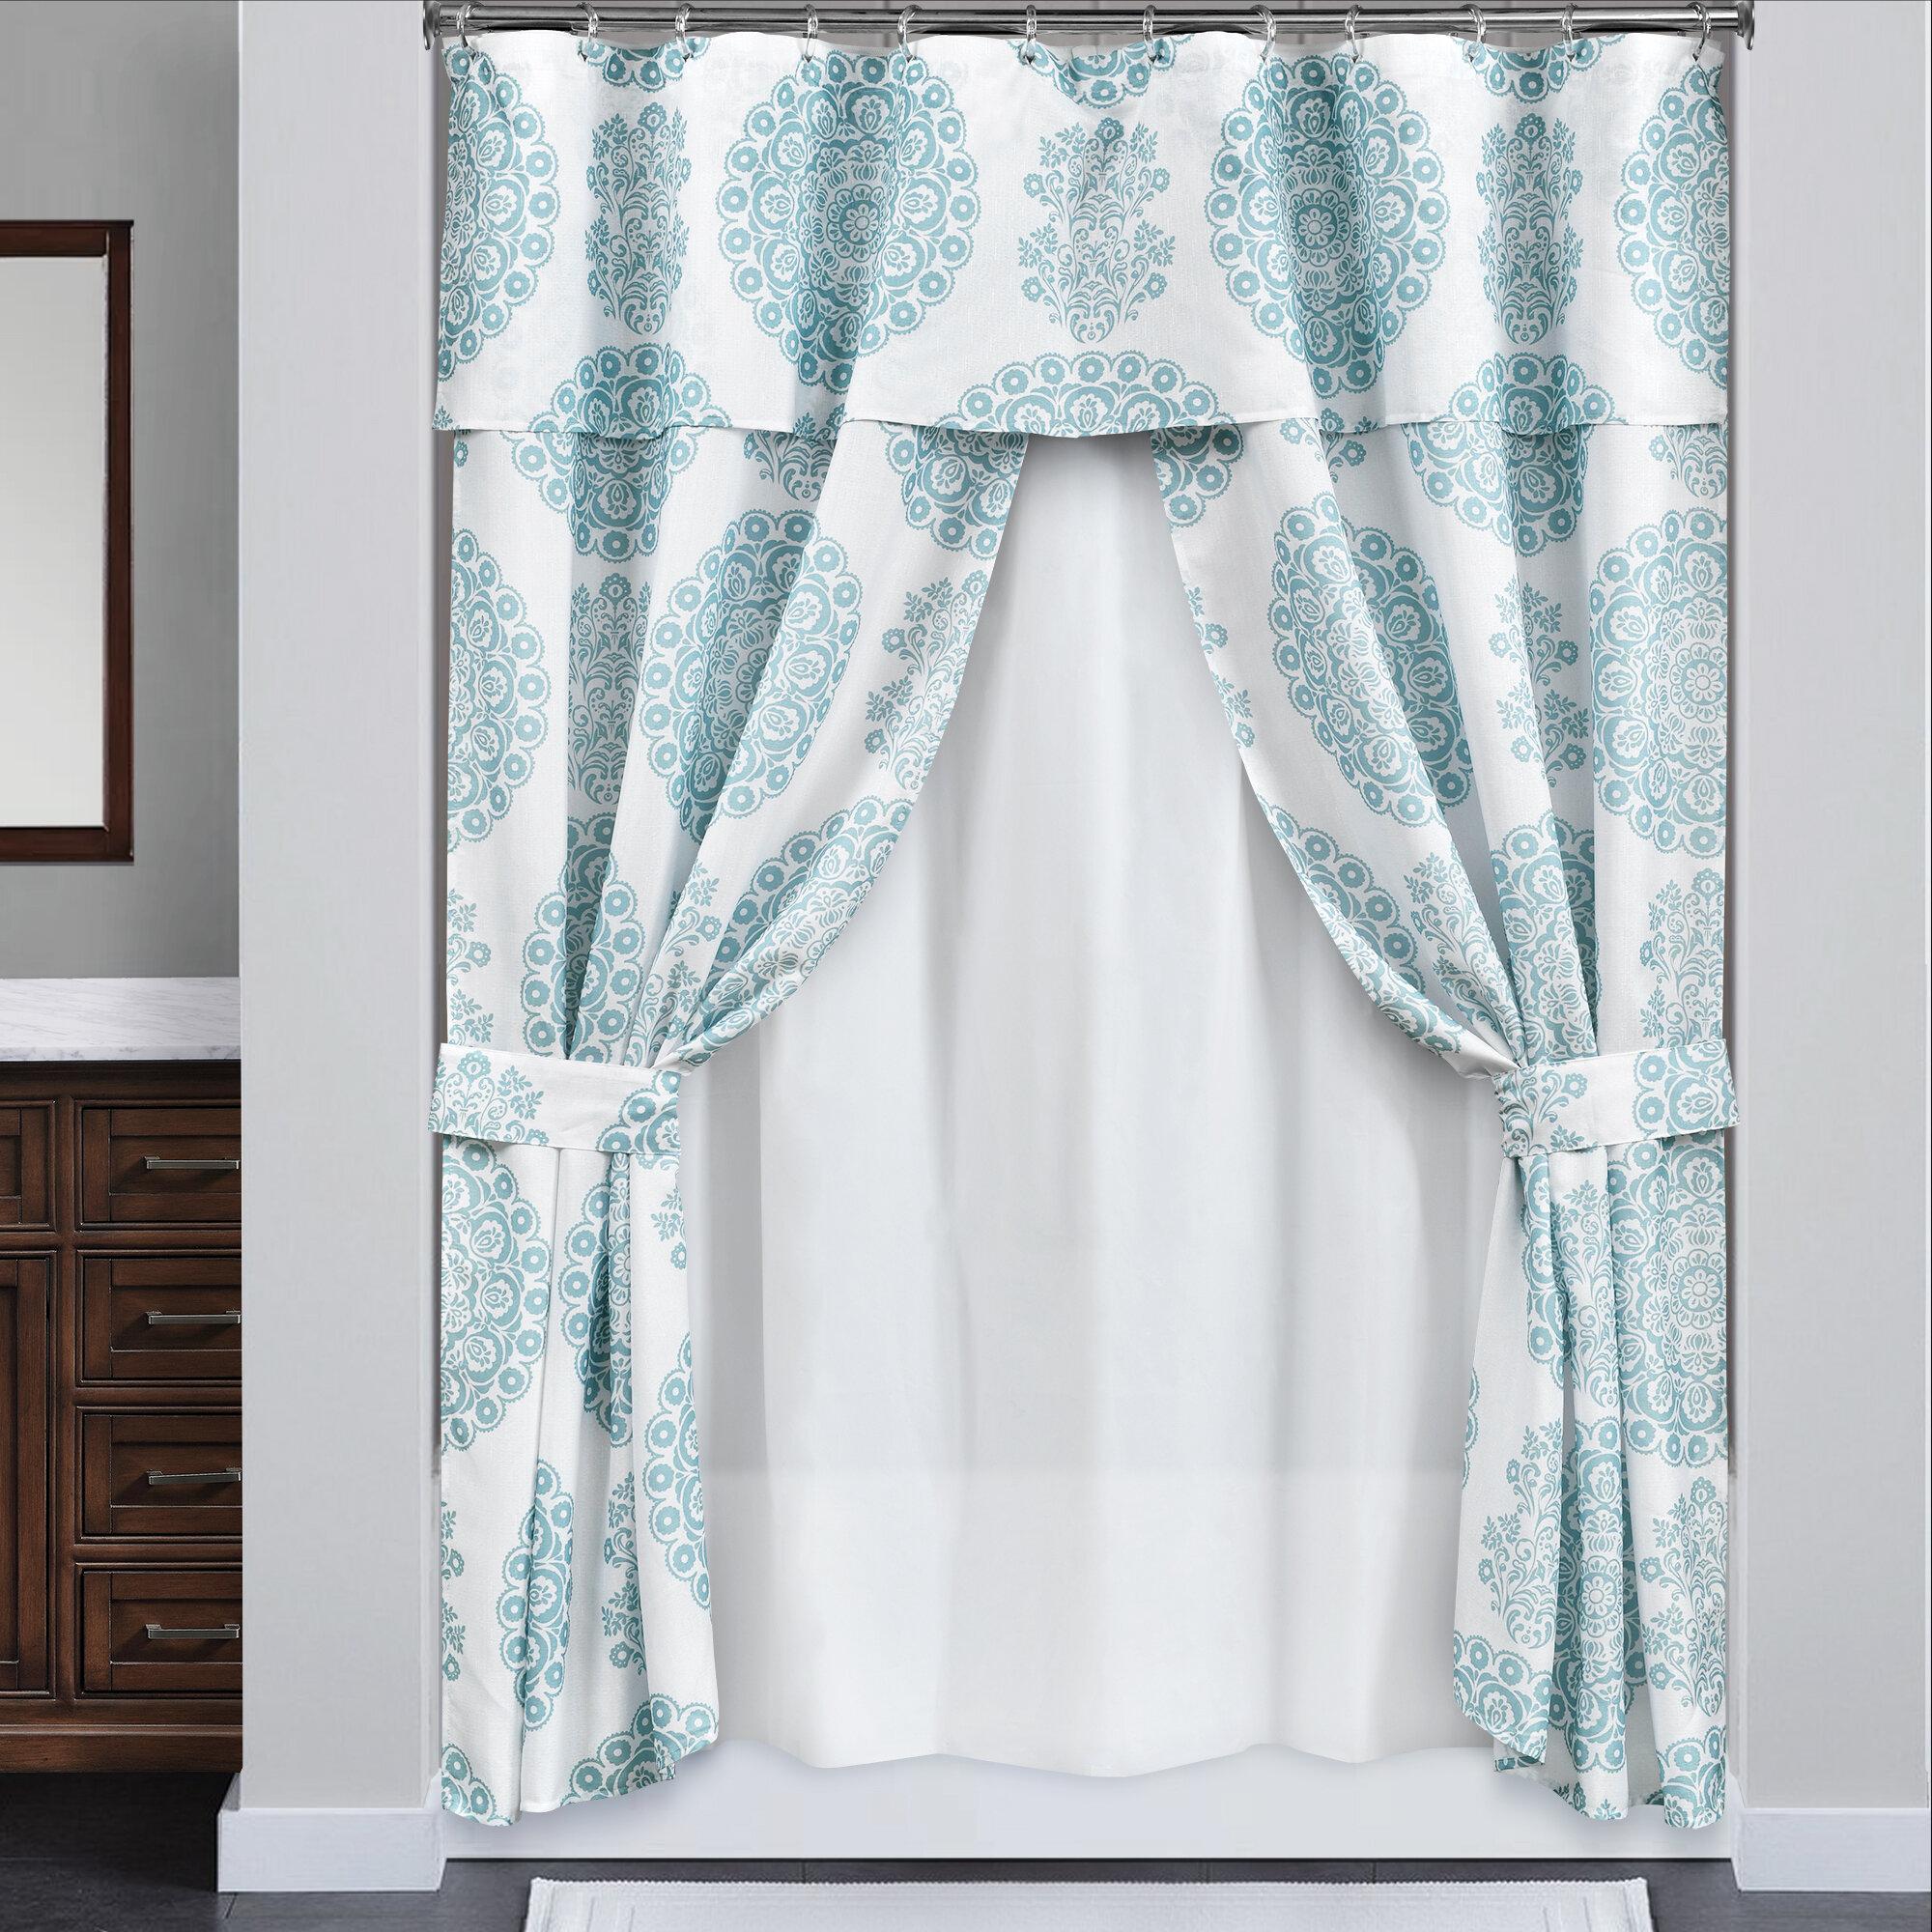 Fashion Shower Curtain Fabric Bathroom Decor Set with Hooks 4 Sizes